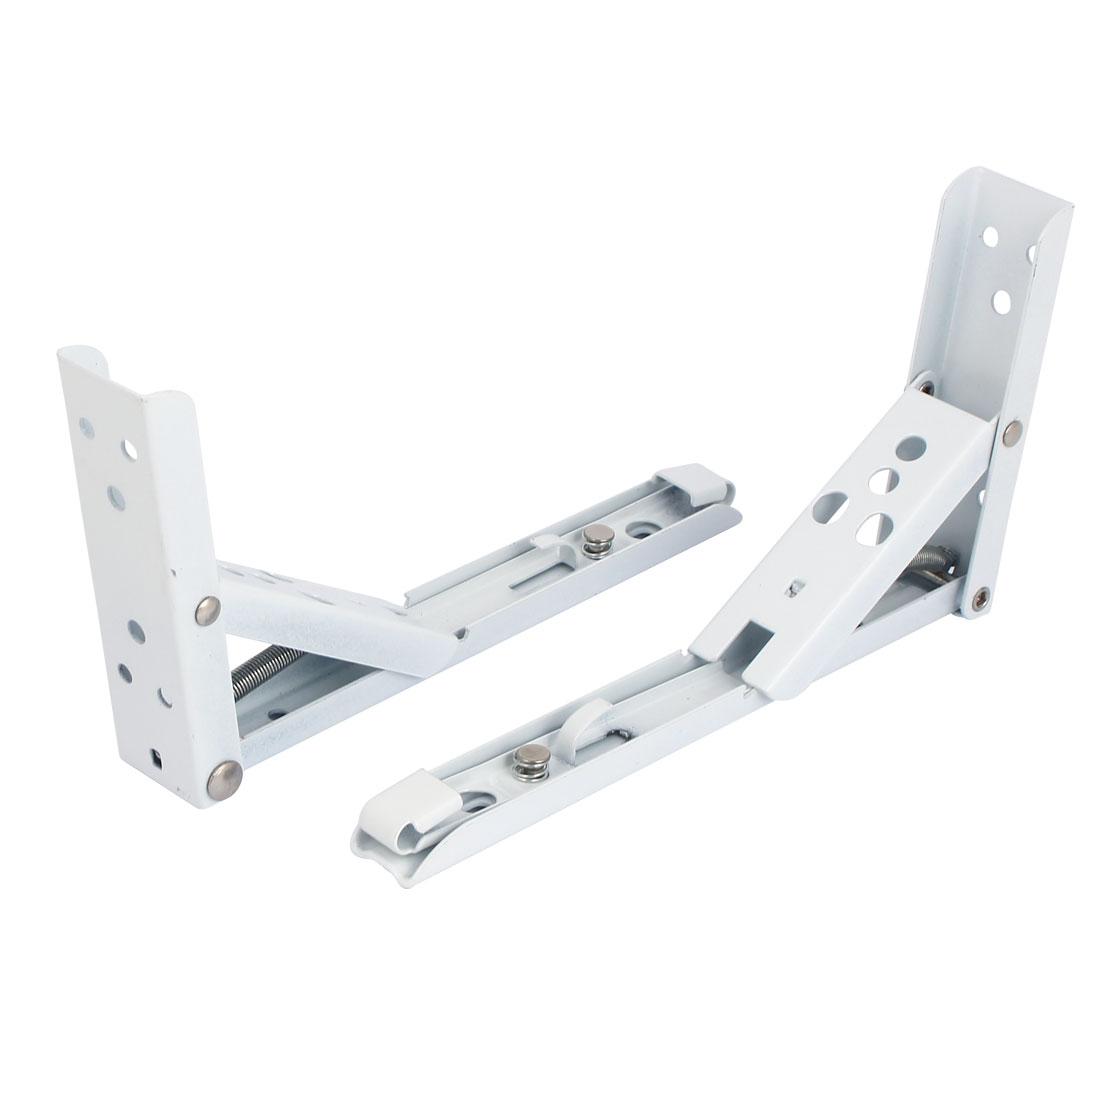 195mm x 110mm Folding Spring Wall Mounted Shelf Bracket Brace Support 2pcs